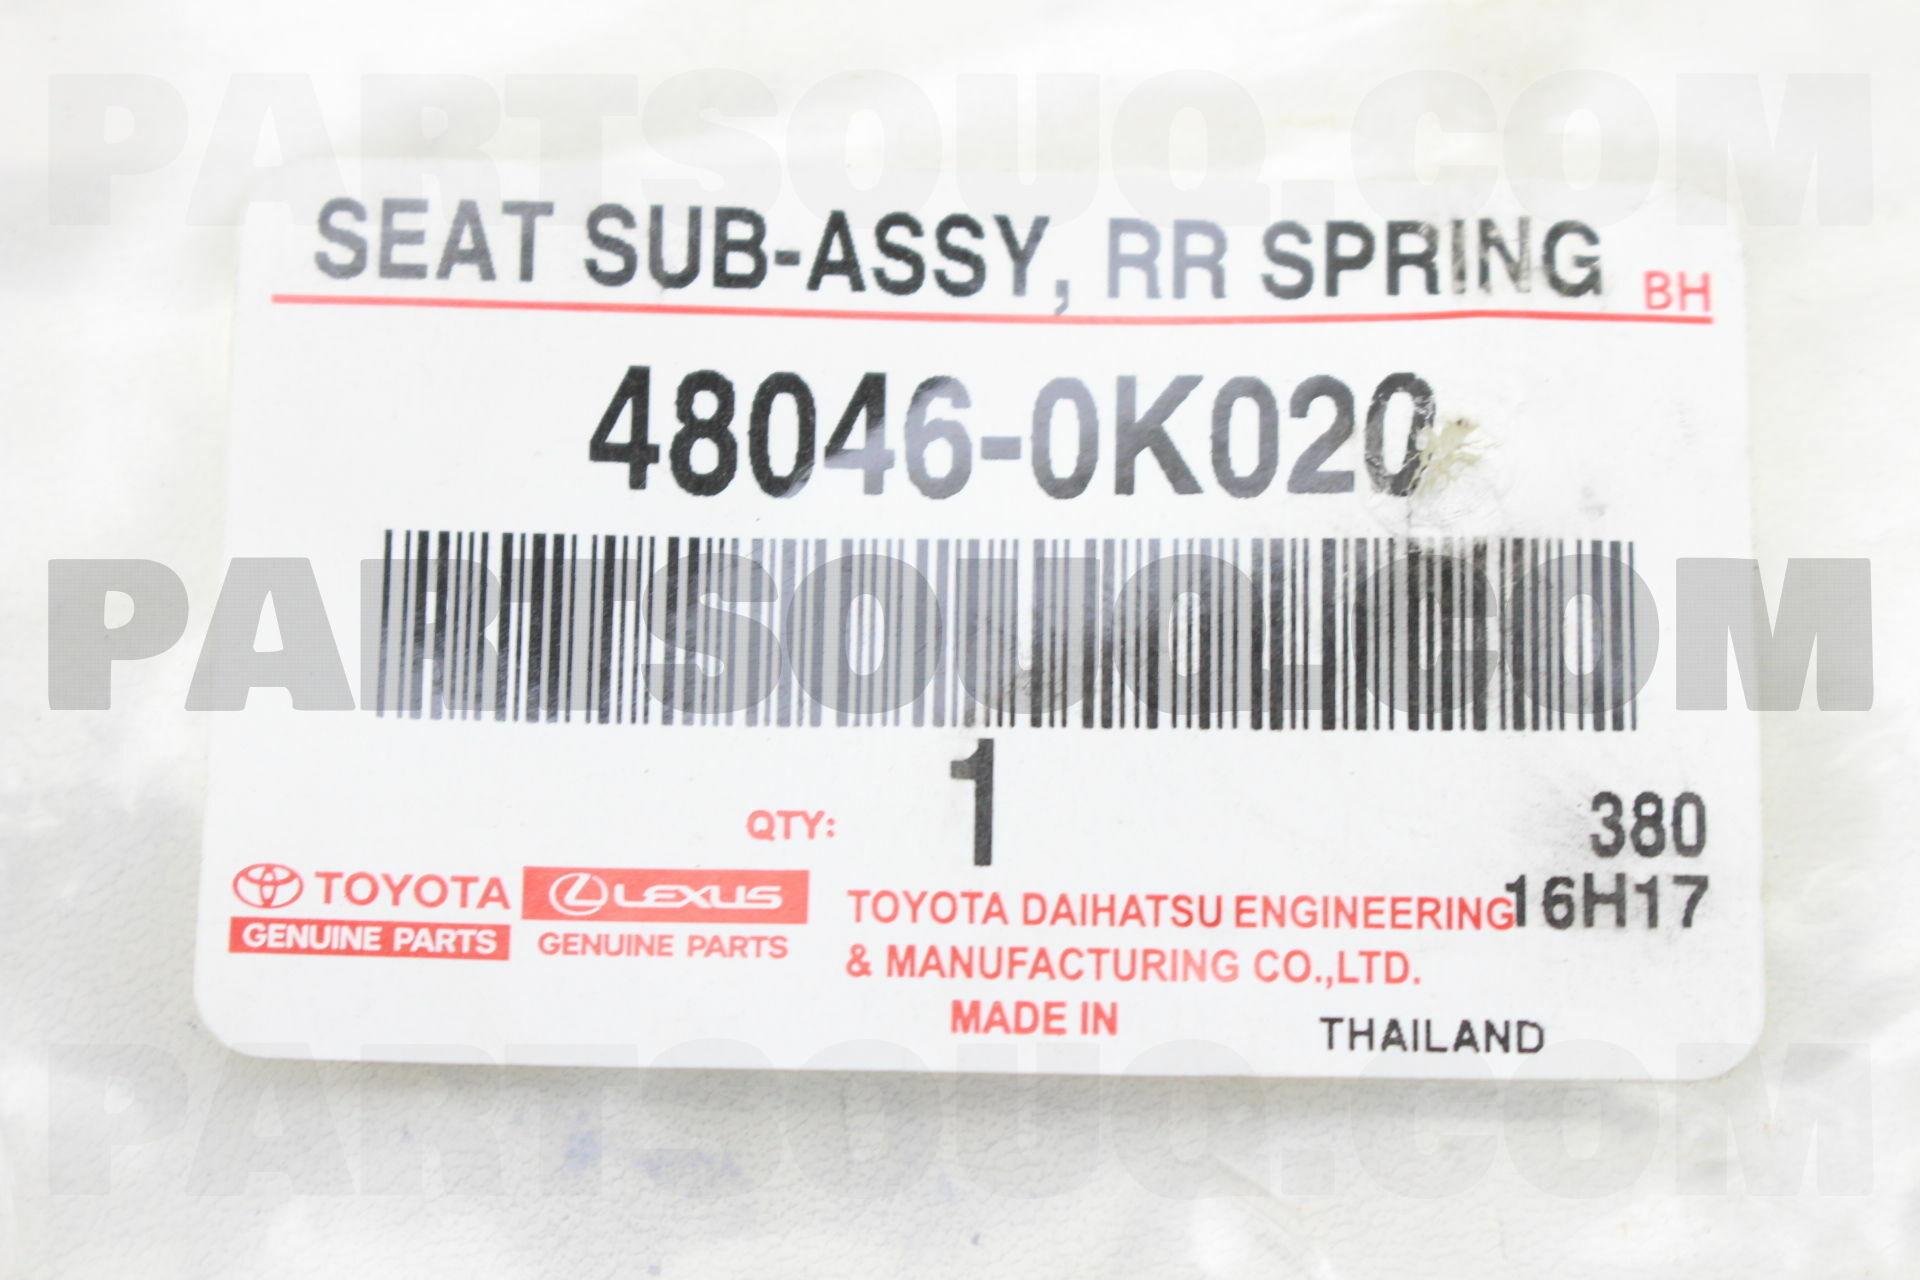 TOYOTA 48046-35170 Spring U-Bolt Seat Sub Assembly